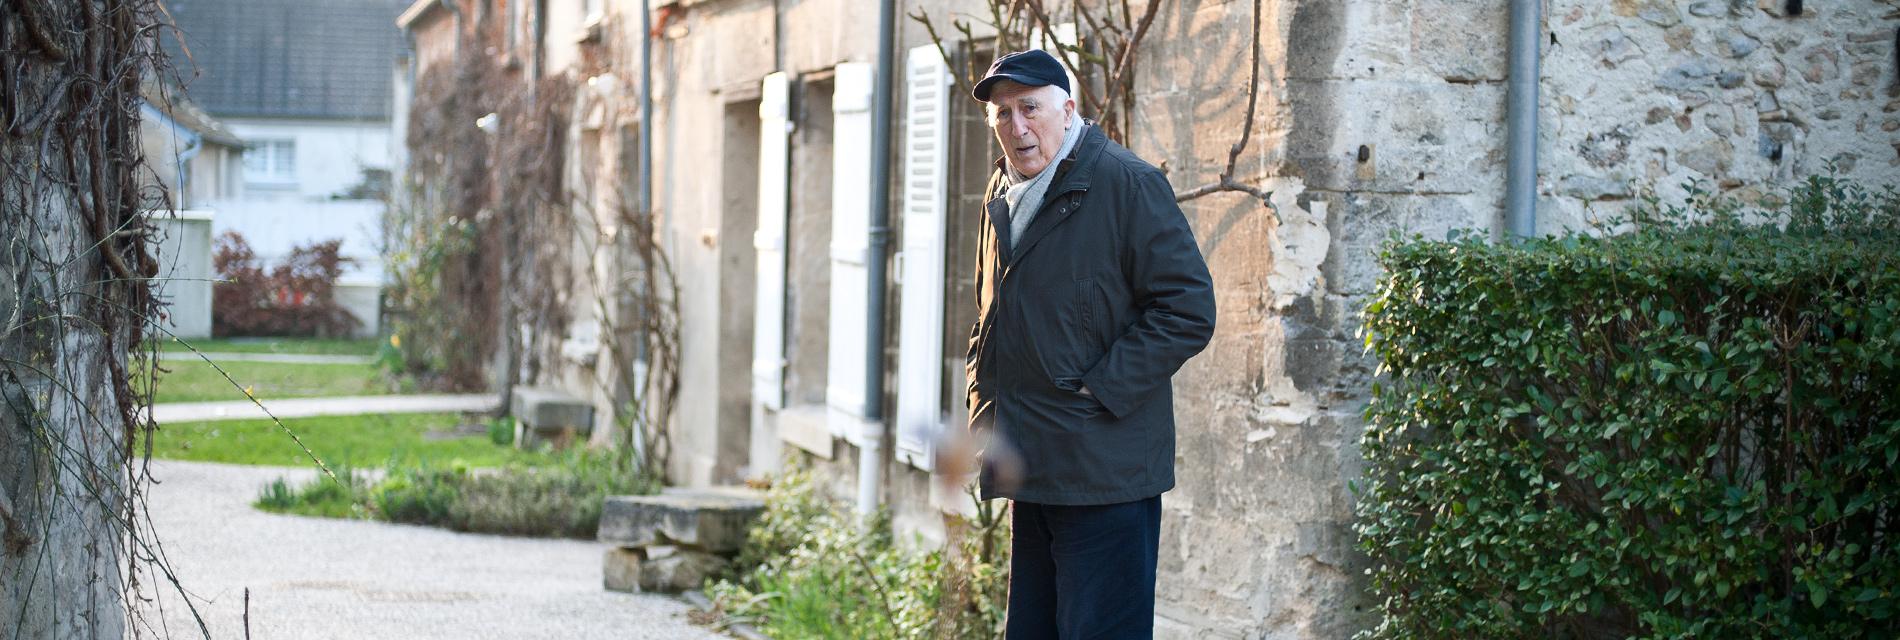 Jean Vanier (1928-2019)